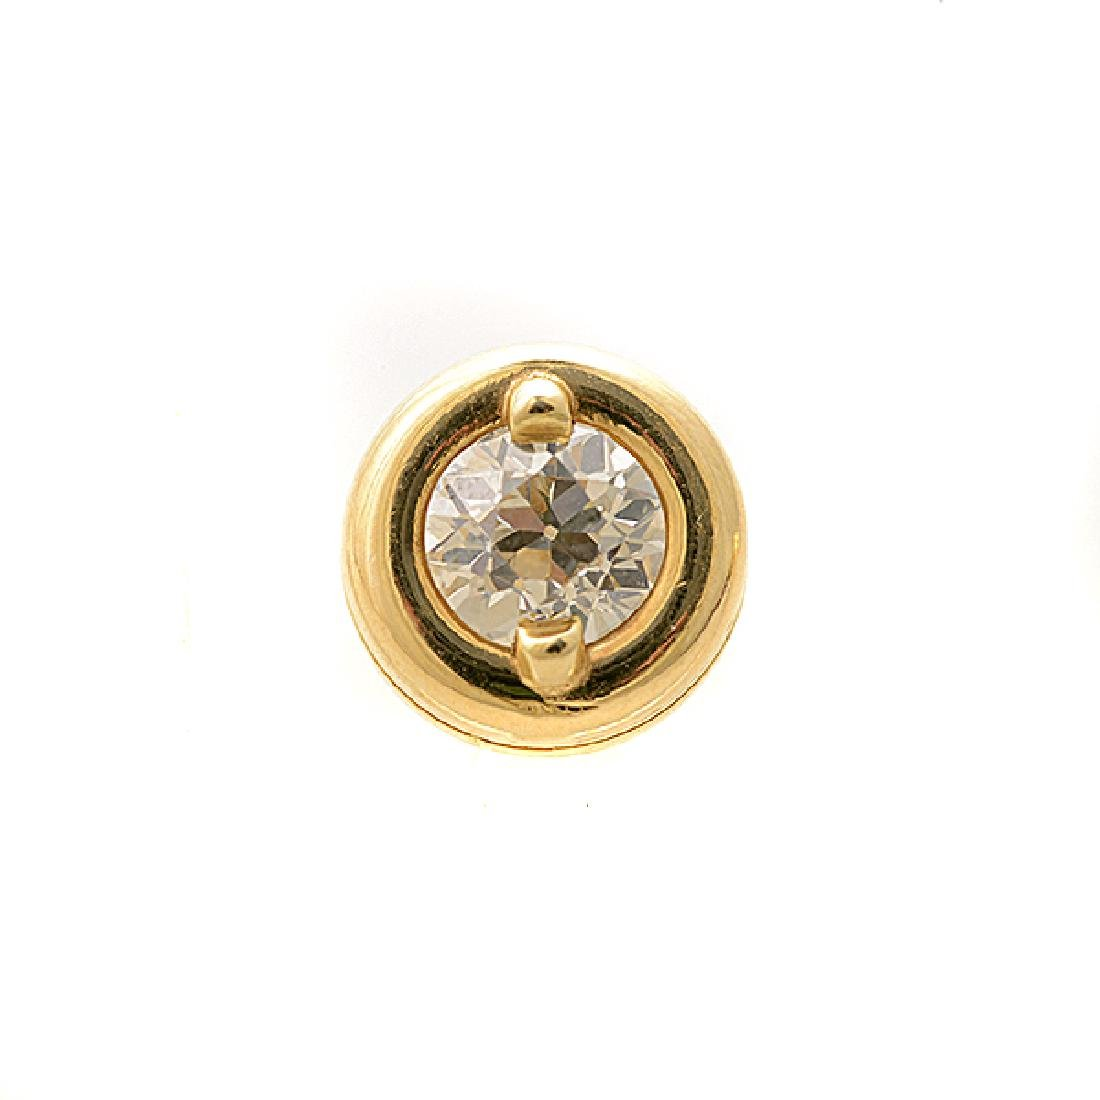 Pair of Diamond, 14k Yellow Gold Stud Earrings. - 2